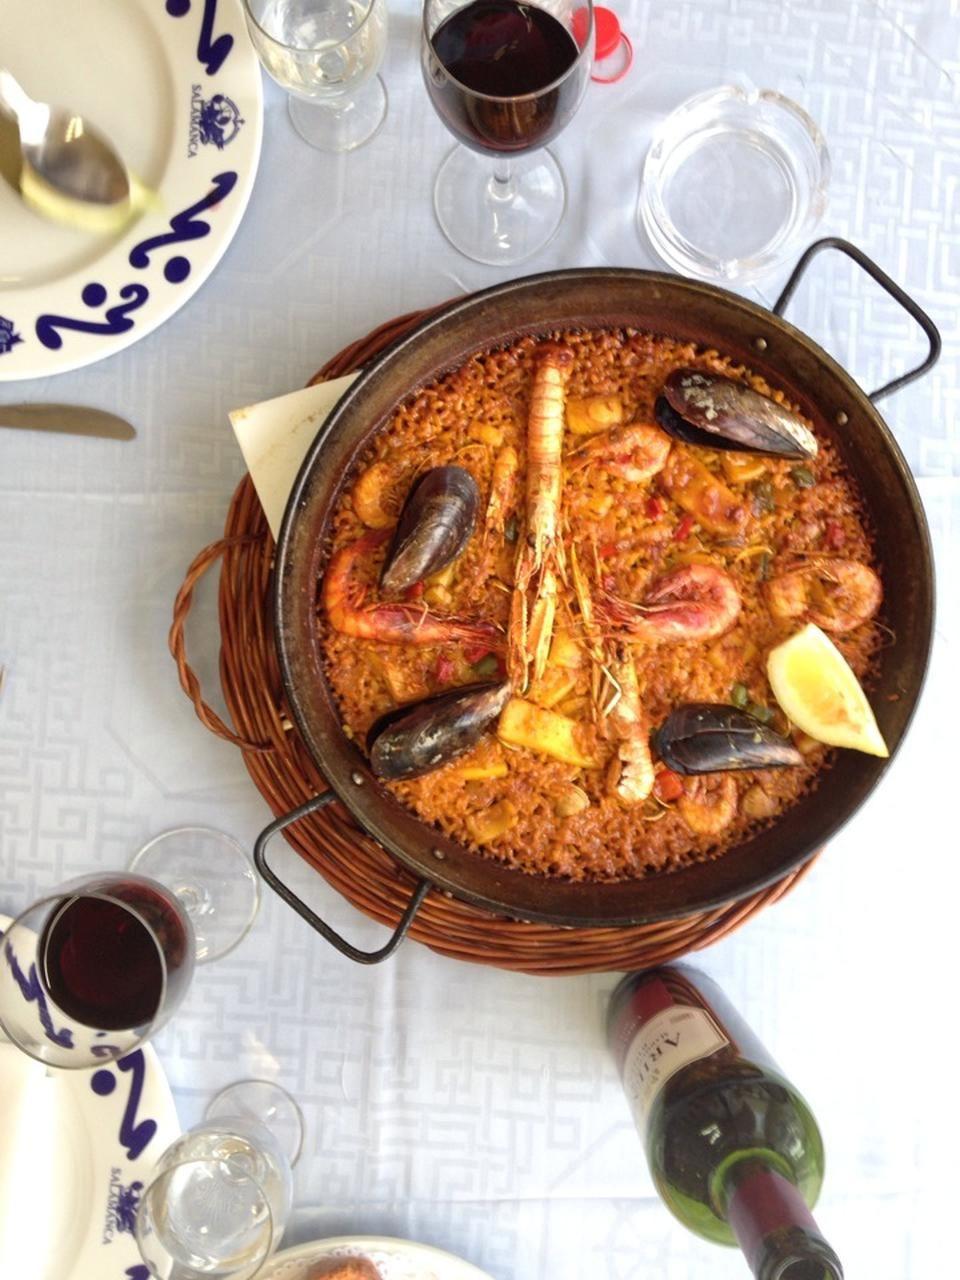 Paella at Salamanca - La Barceloneta - Barcelona, Cataluña